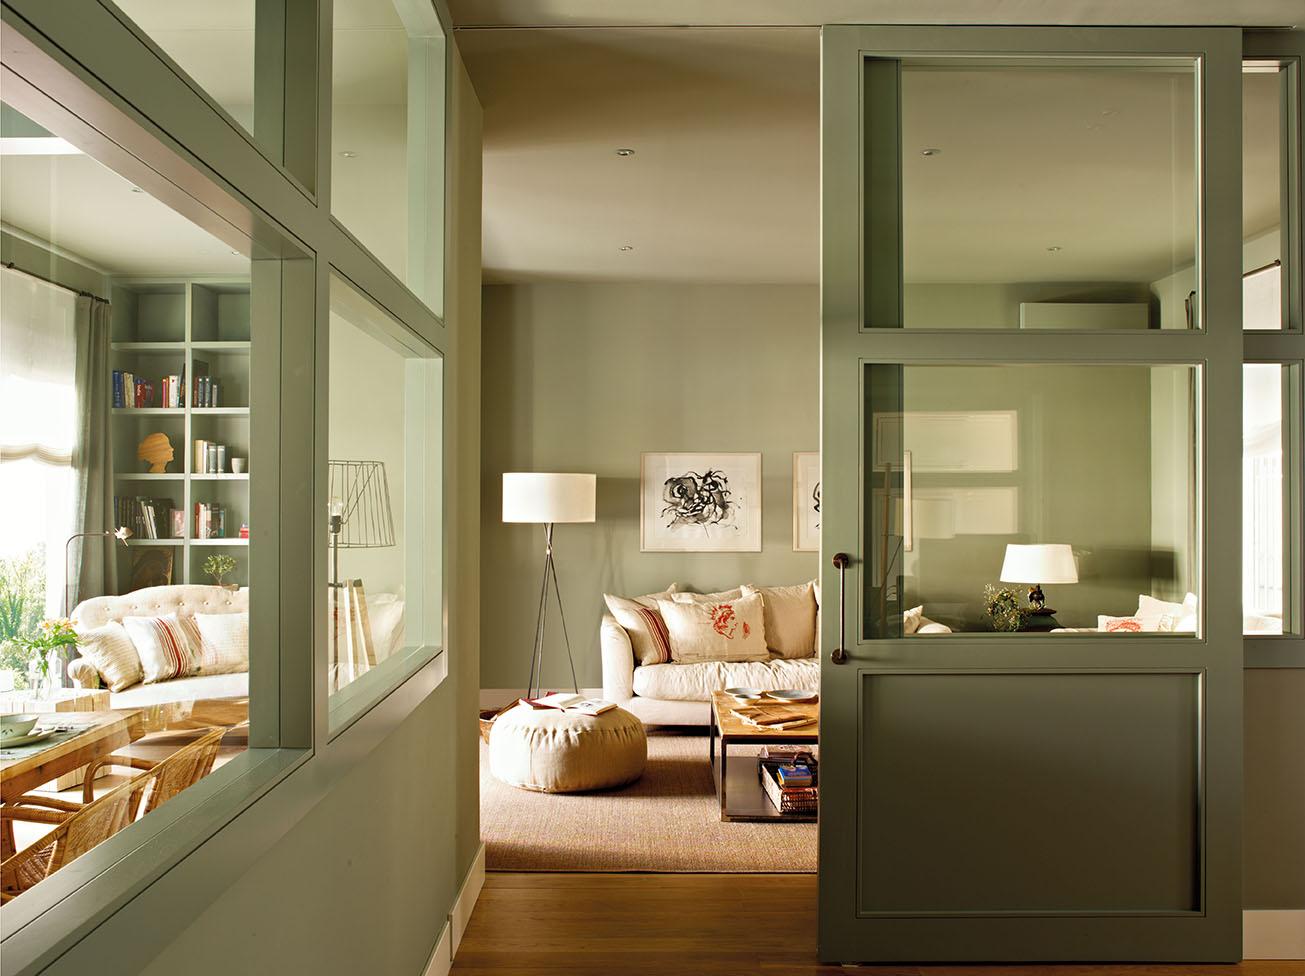 Puertas correderas de cristal de madera o empotradas - Puertas de salon con cristal ...